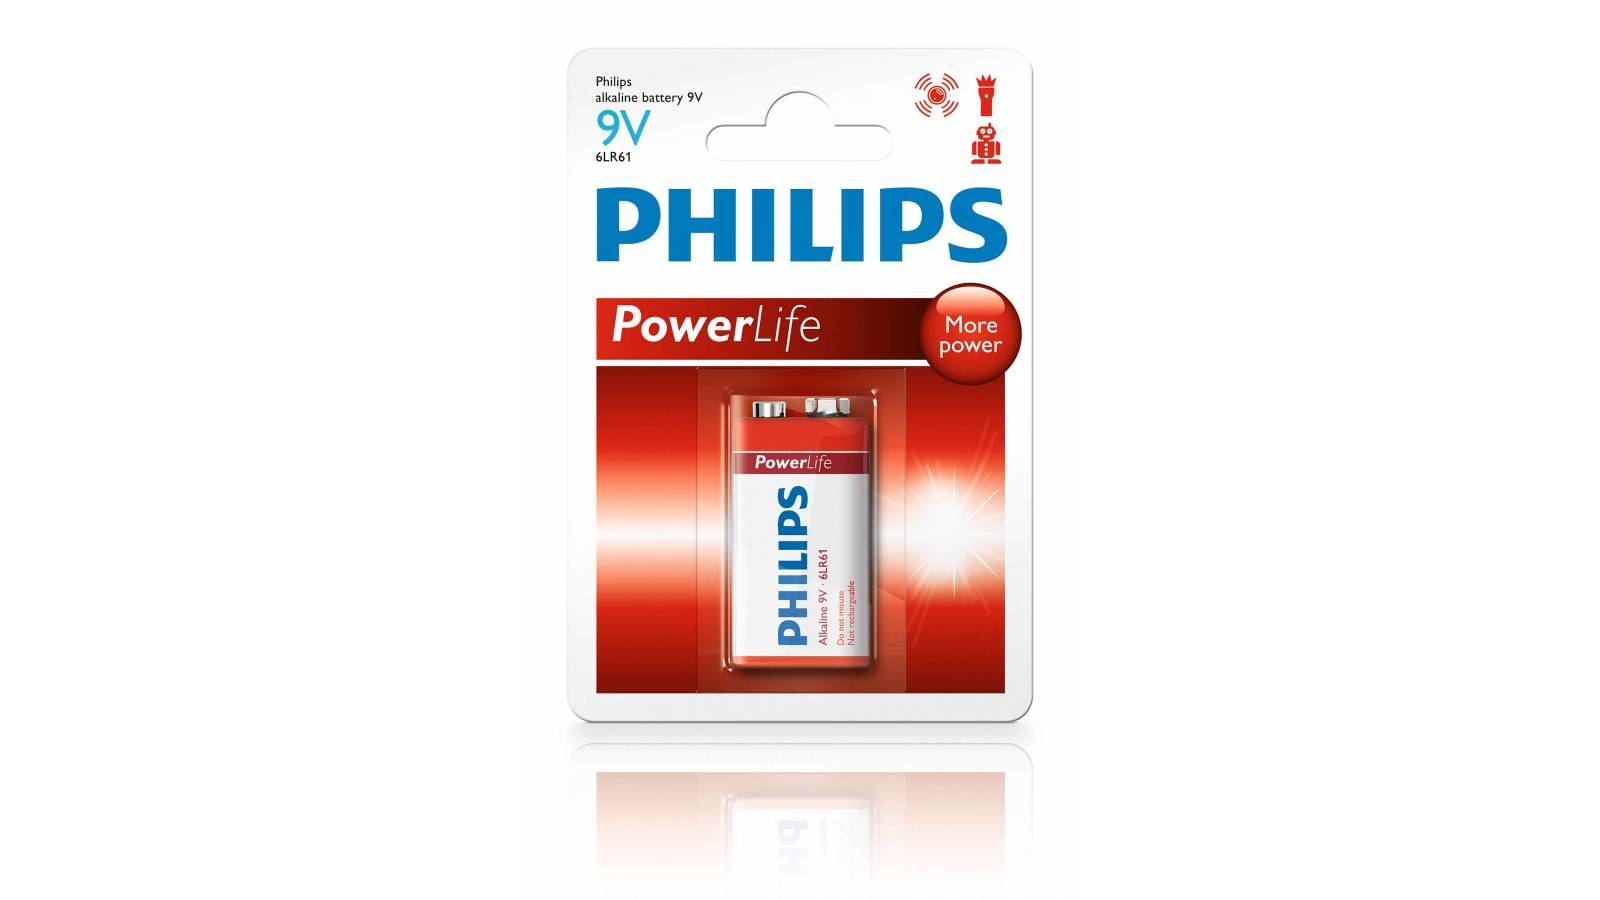 Pila Batería Philips Alcalina 6LR61P1B/97 9V